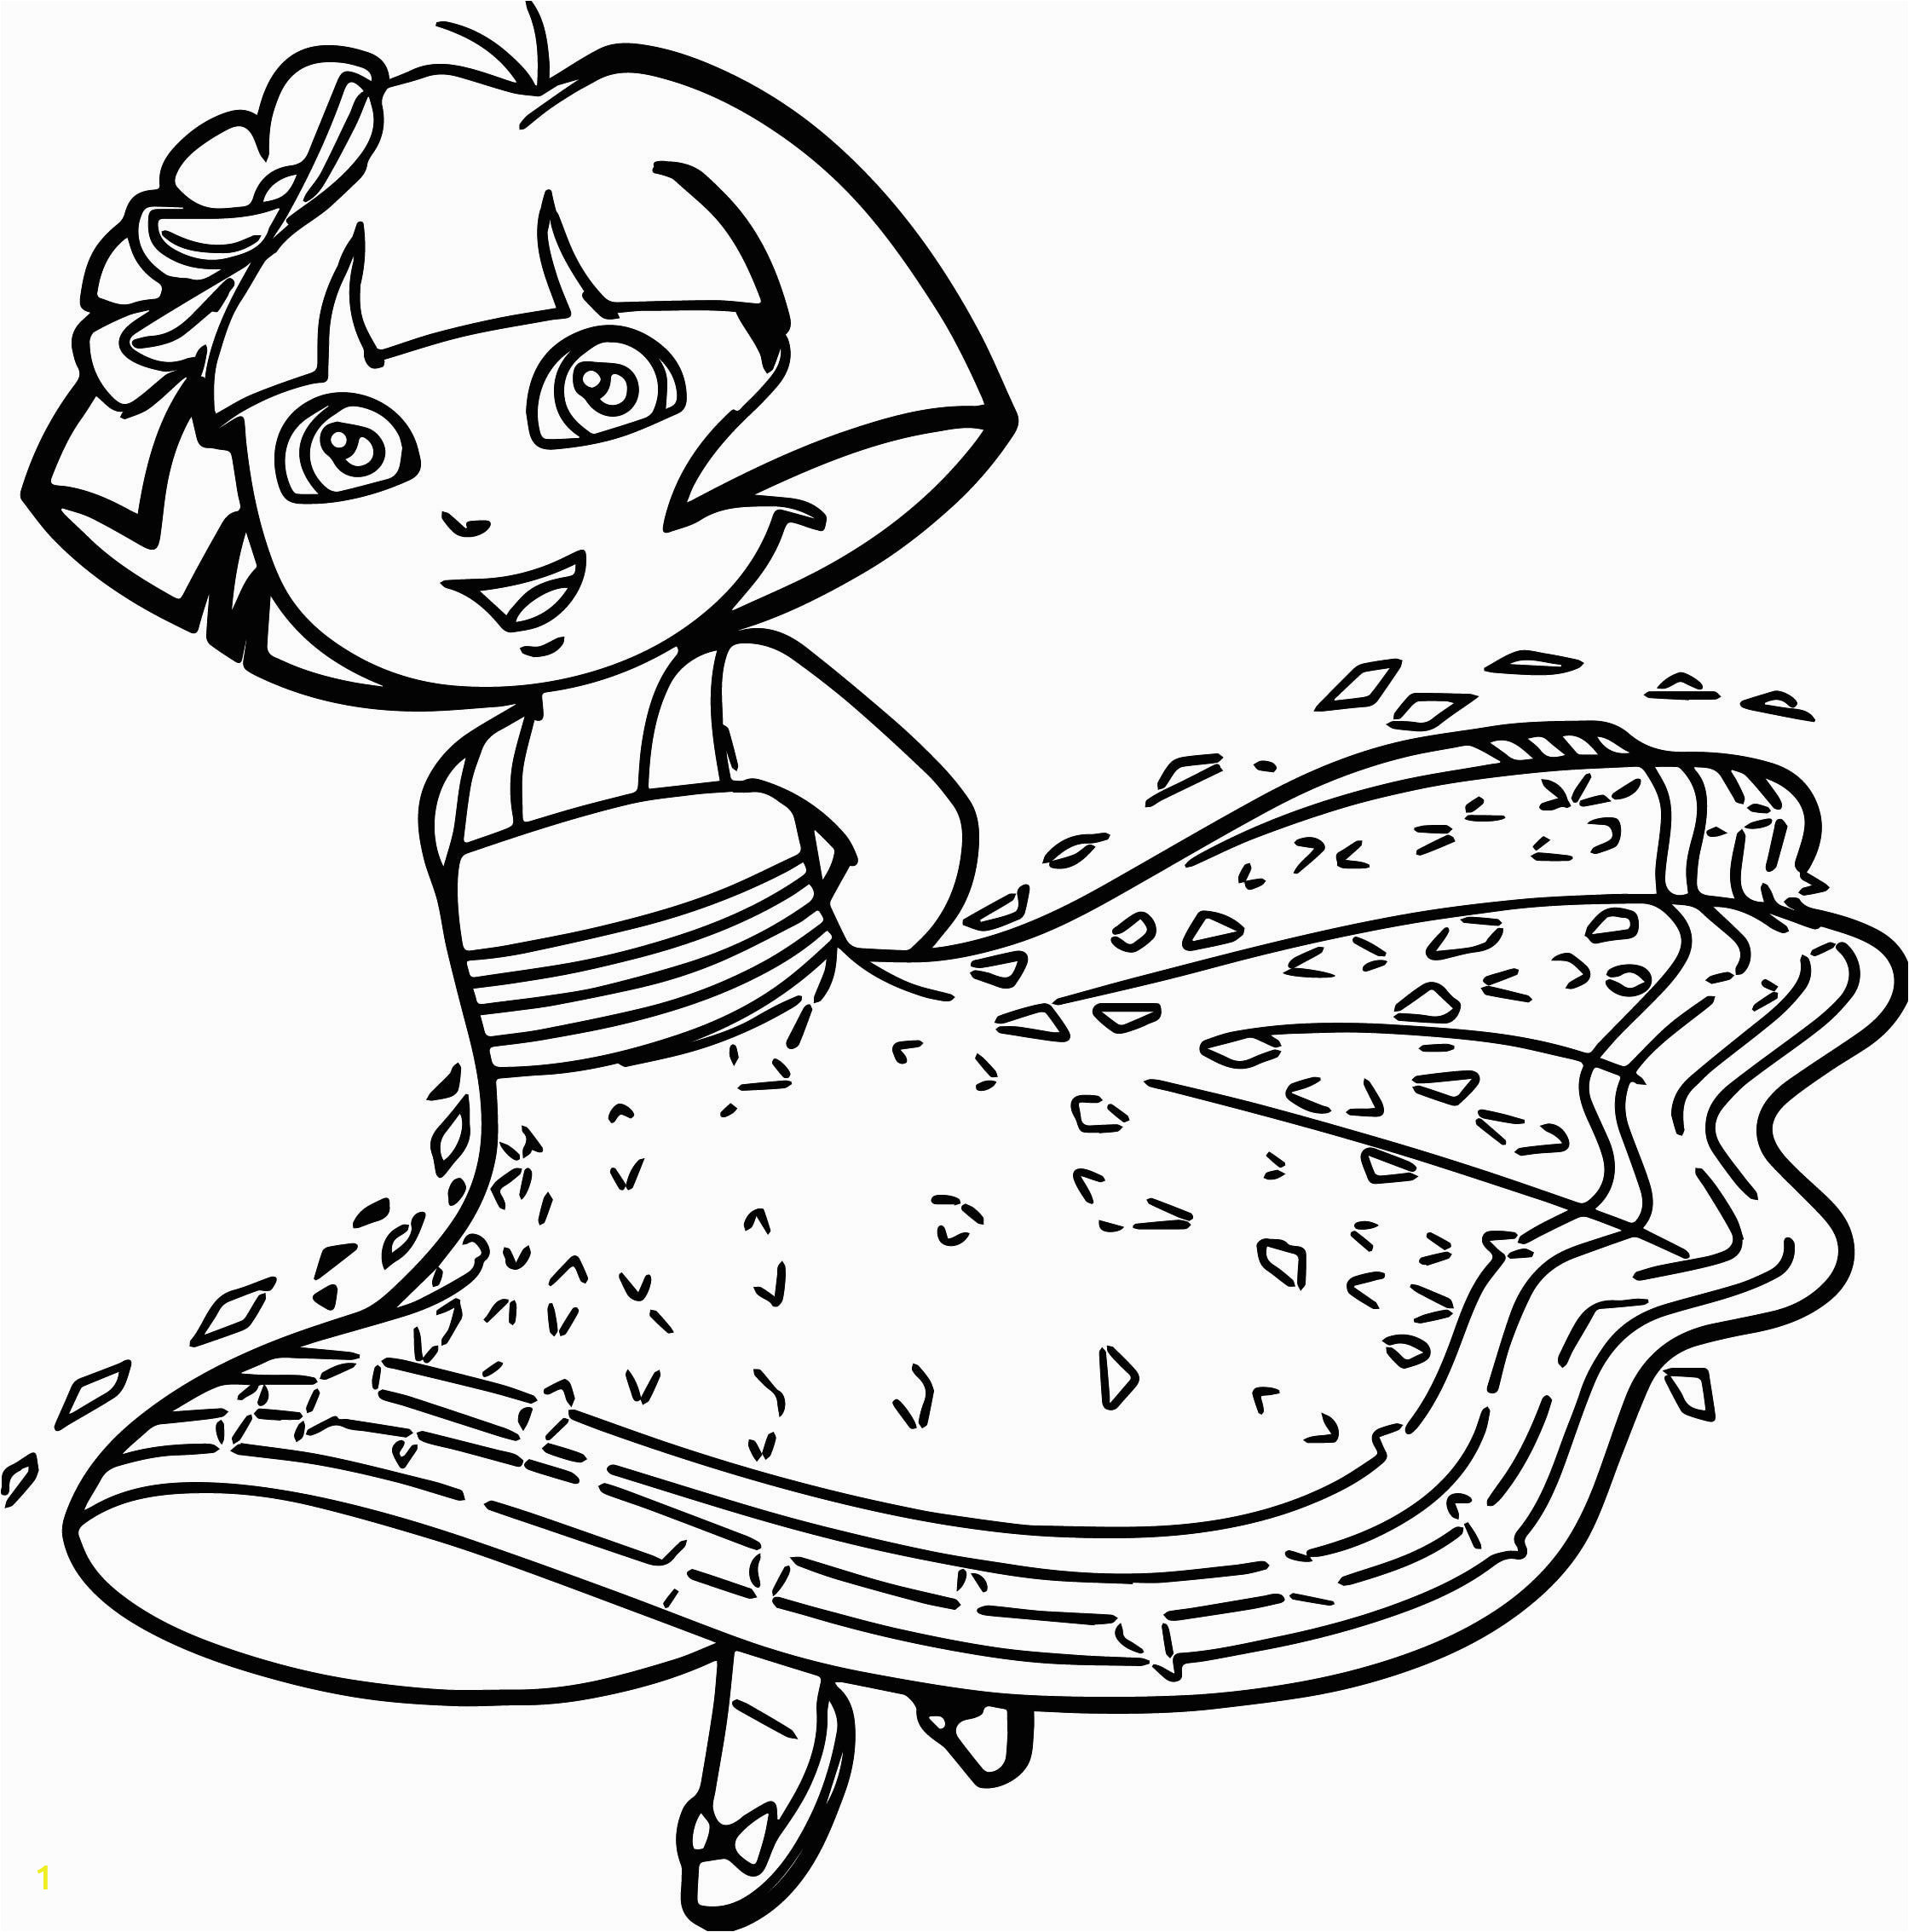 Dora Coloring Pages Halloween | divyajanani.org